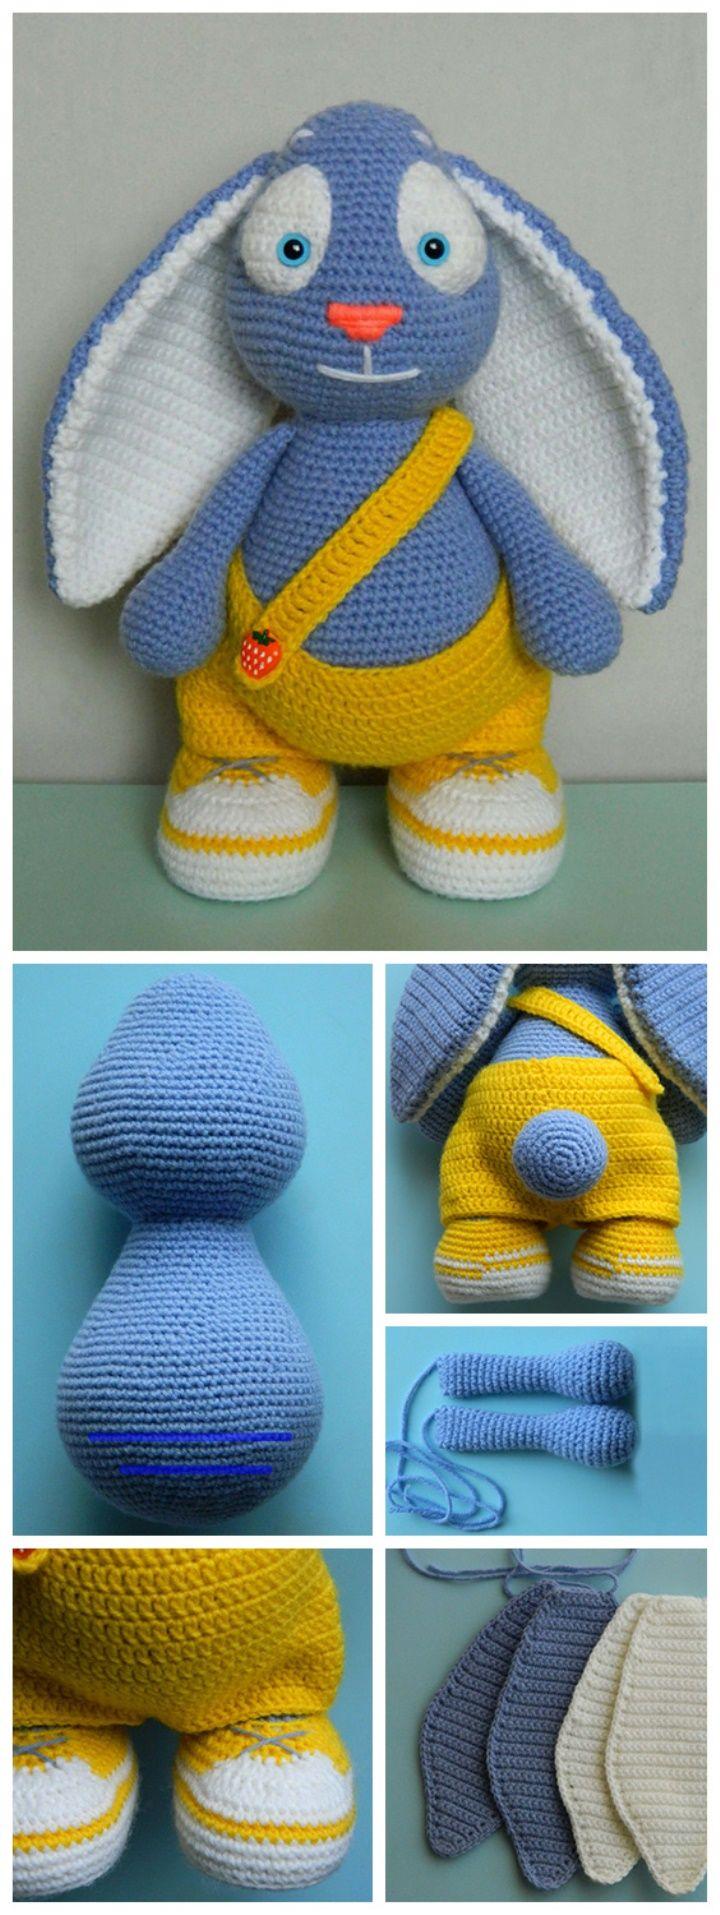 Bunny Amigurumi Step-by-Step Tutorial #amigurumi #amigurumipattern #crochet #tut…